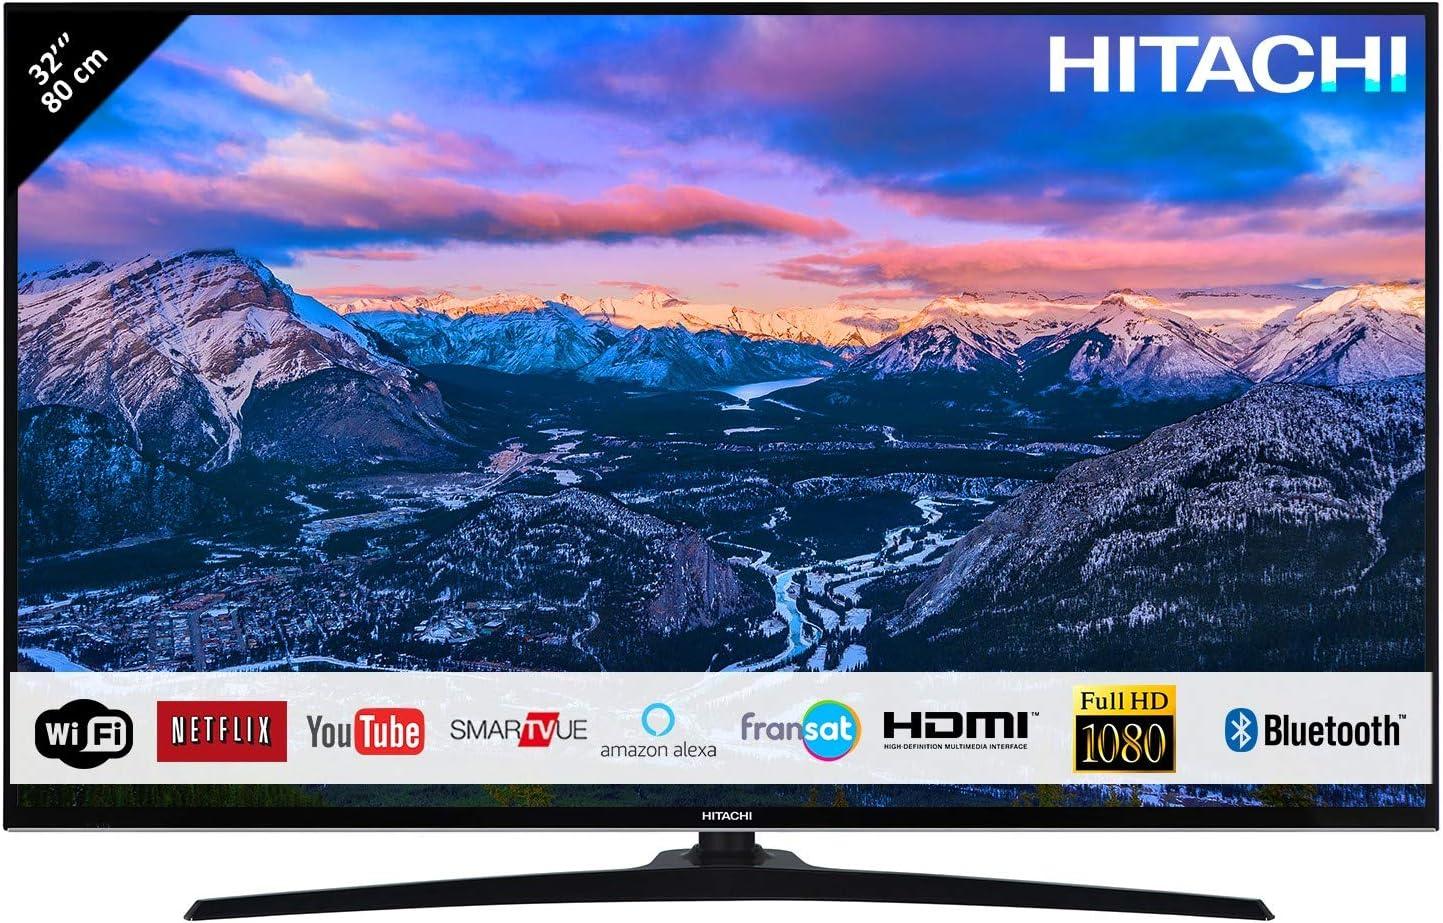 Televisor HITACHI de 32